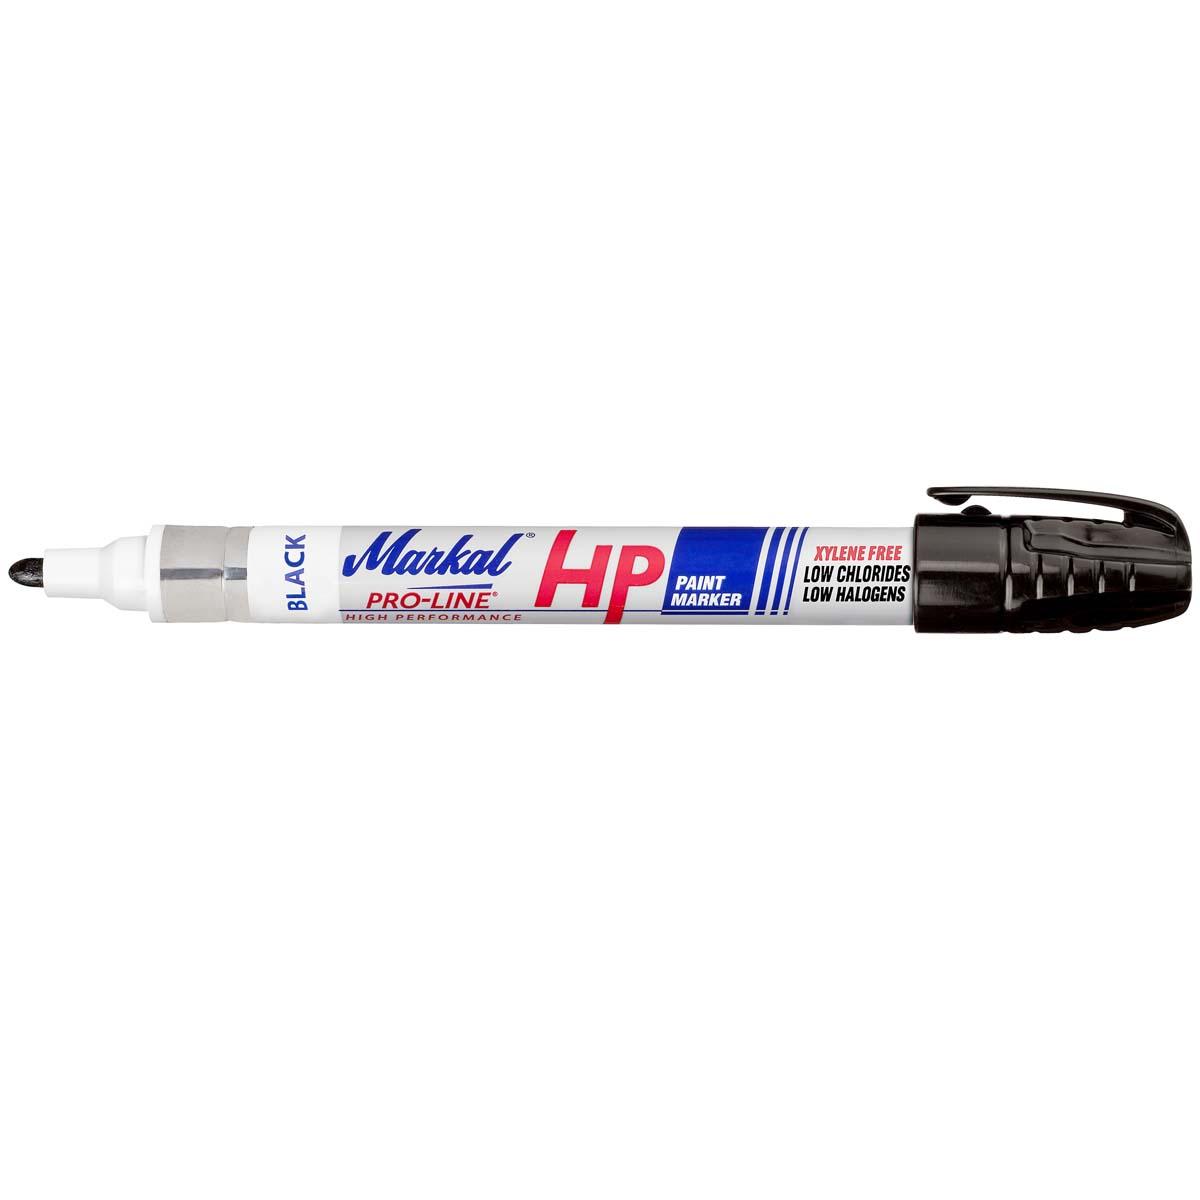 PRO-LINE® HP Liquid Paint Marker, Black